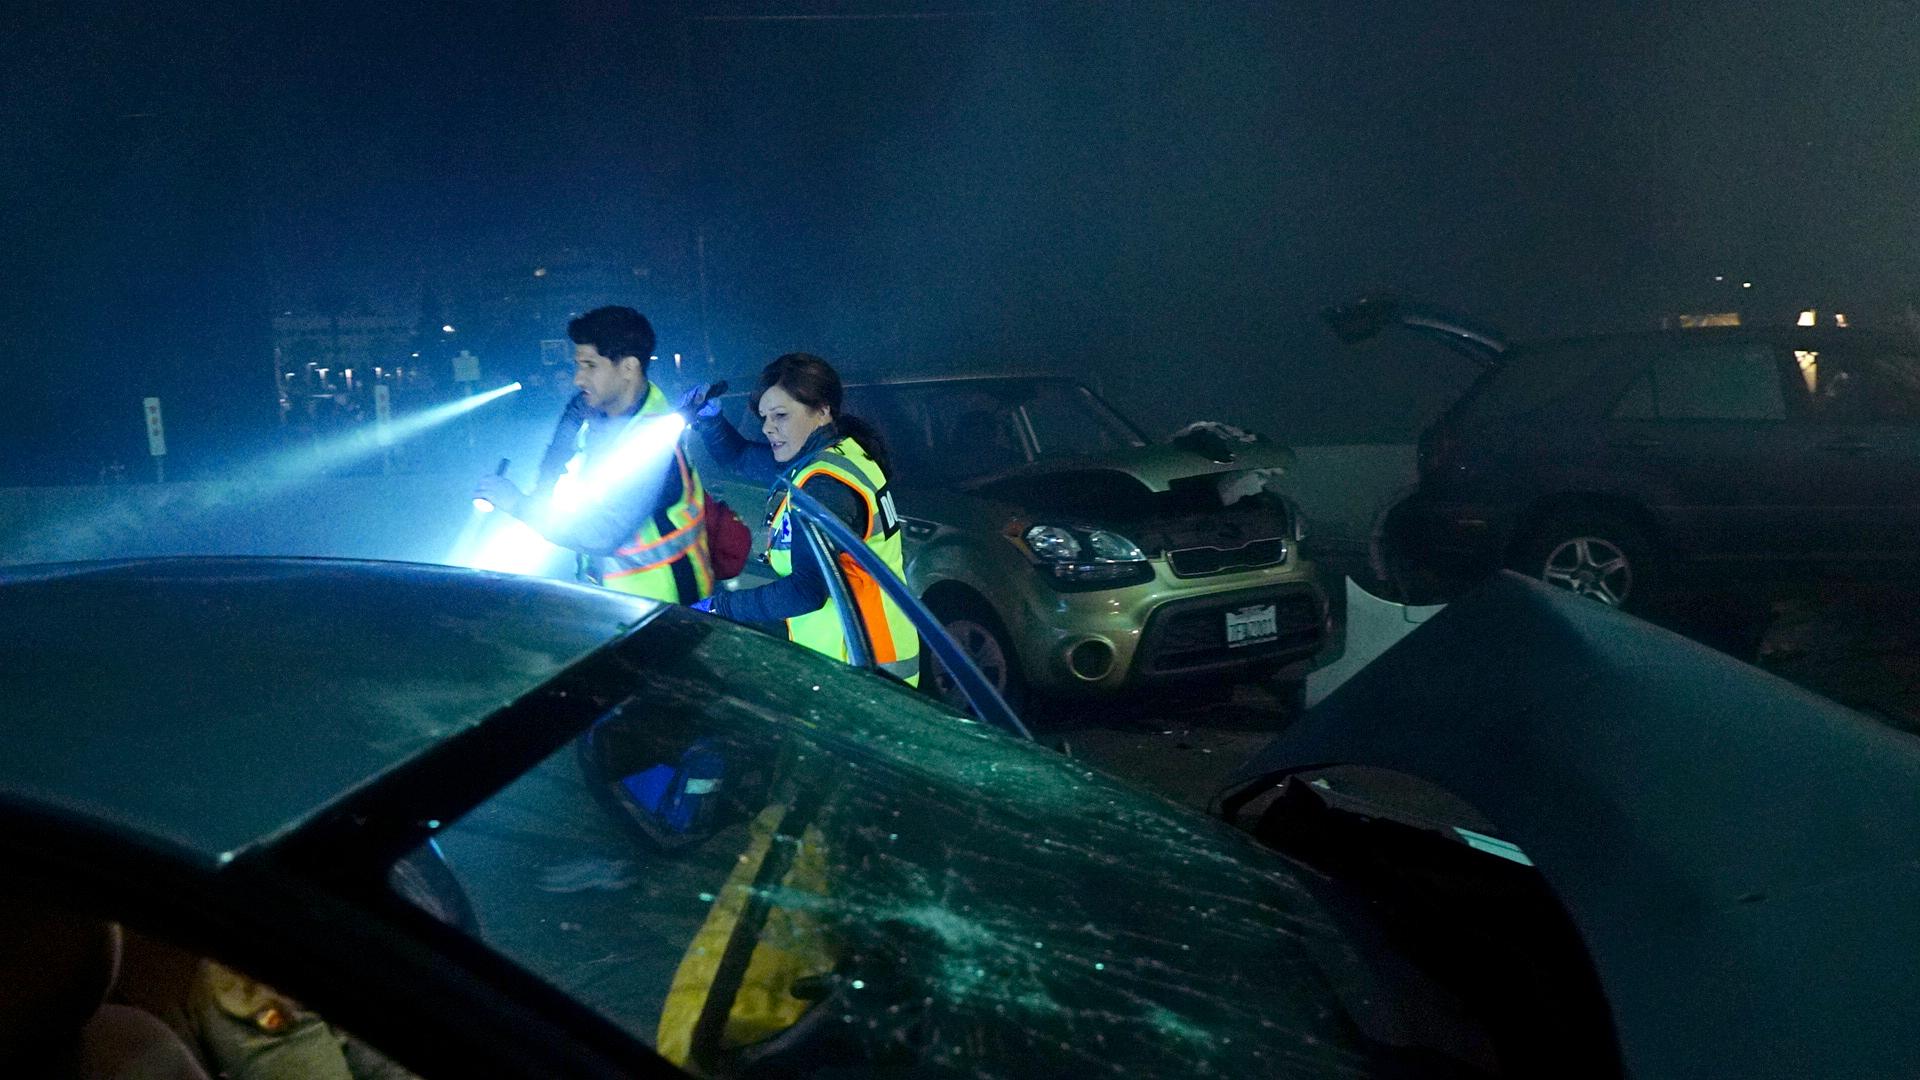 Raza Jaffrey as Dr. Neal Hudson and Marcia Gay Harden as Dr. Leanne Rorish